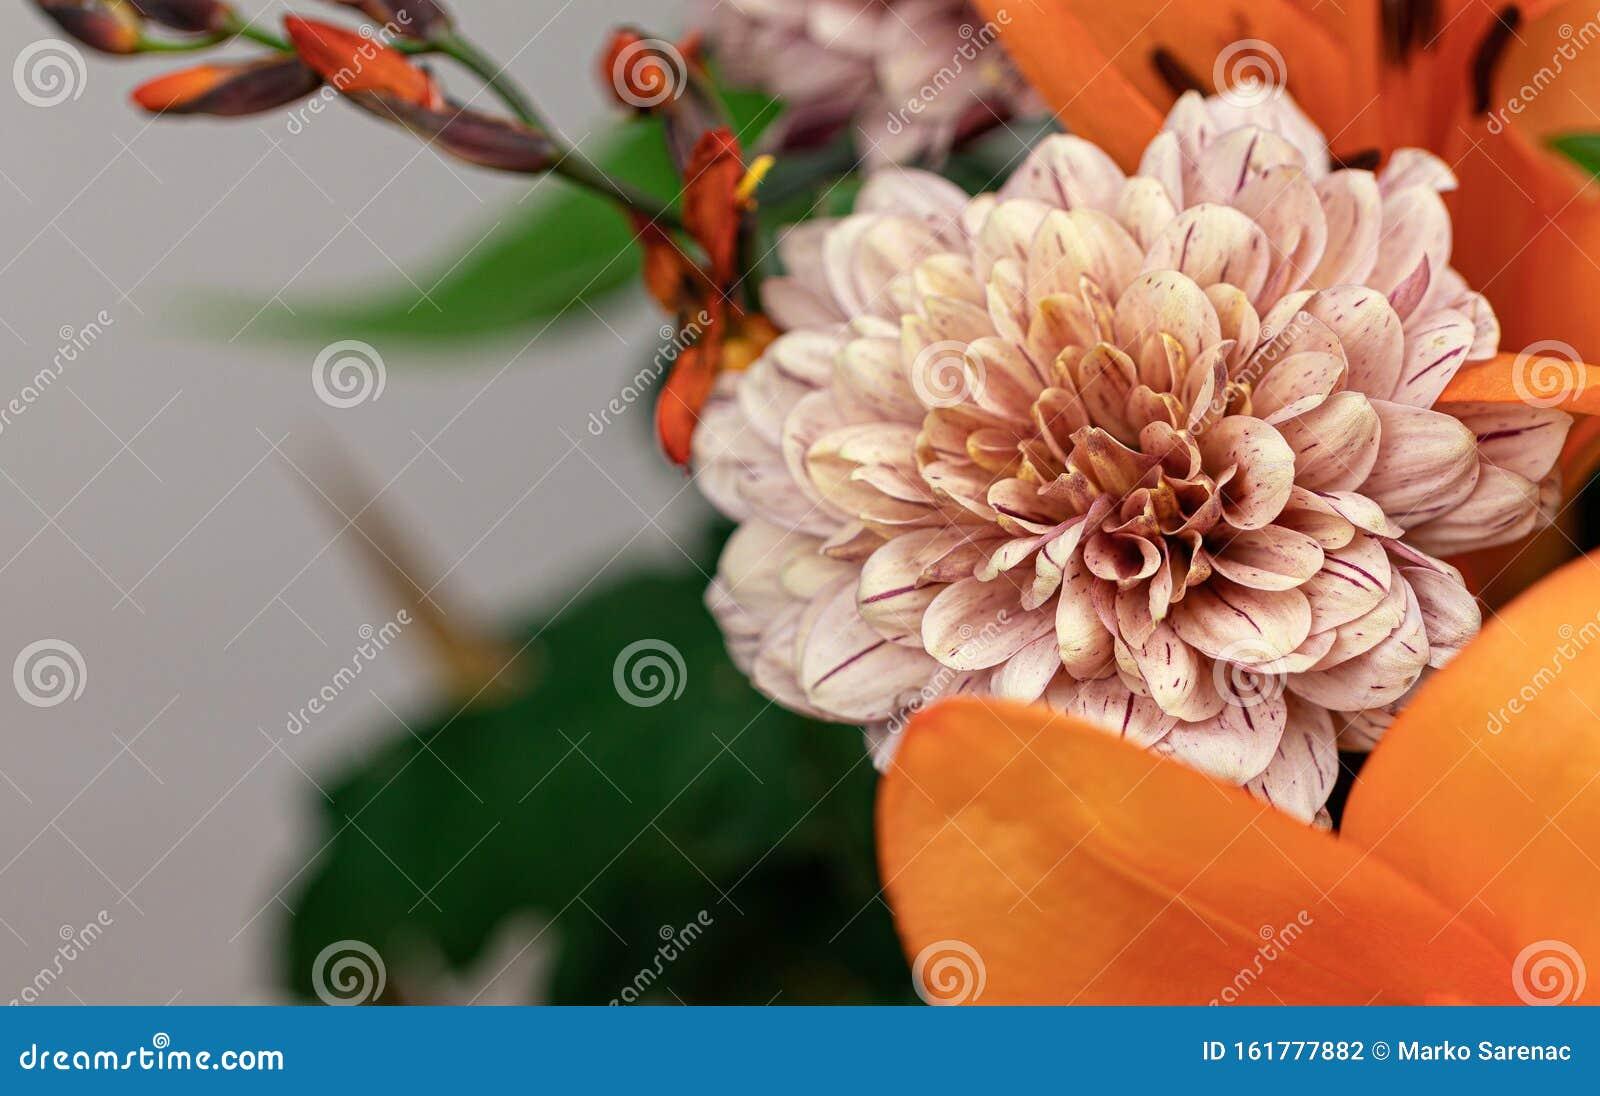 Dahlia Flower Single Flower Daisy Family Flower Head Stock Photo Image Of Beauty Arrangement 161777882